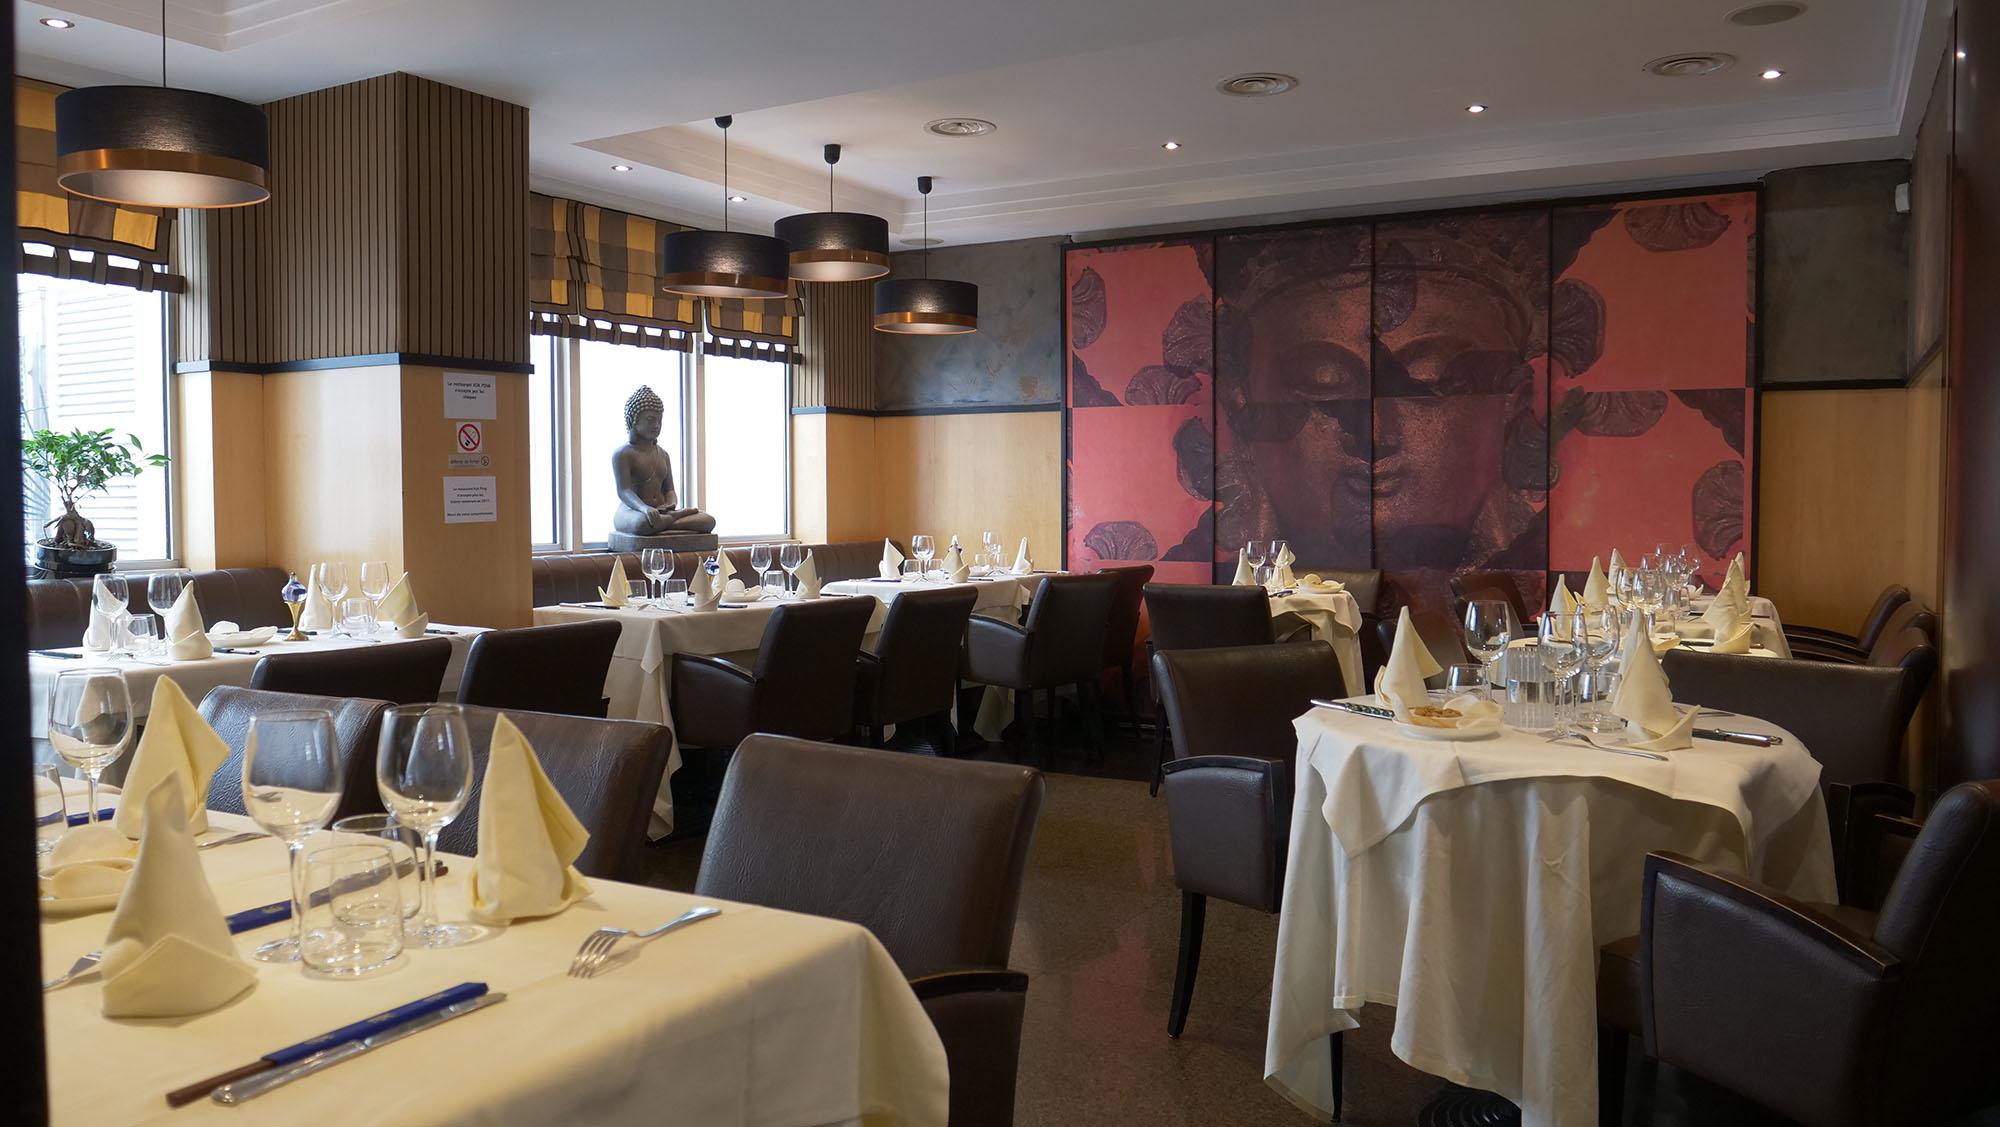 Salle du restaurant Chinois Kok Ping à Paris